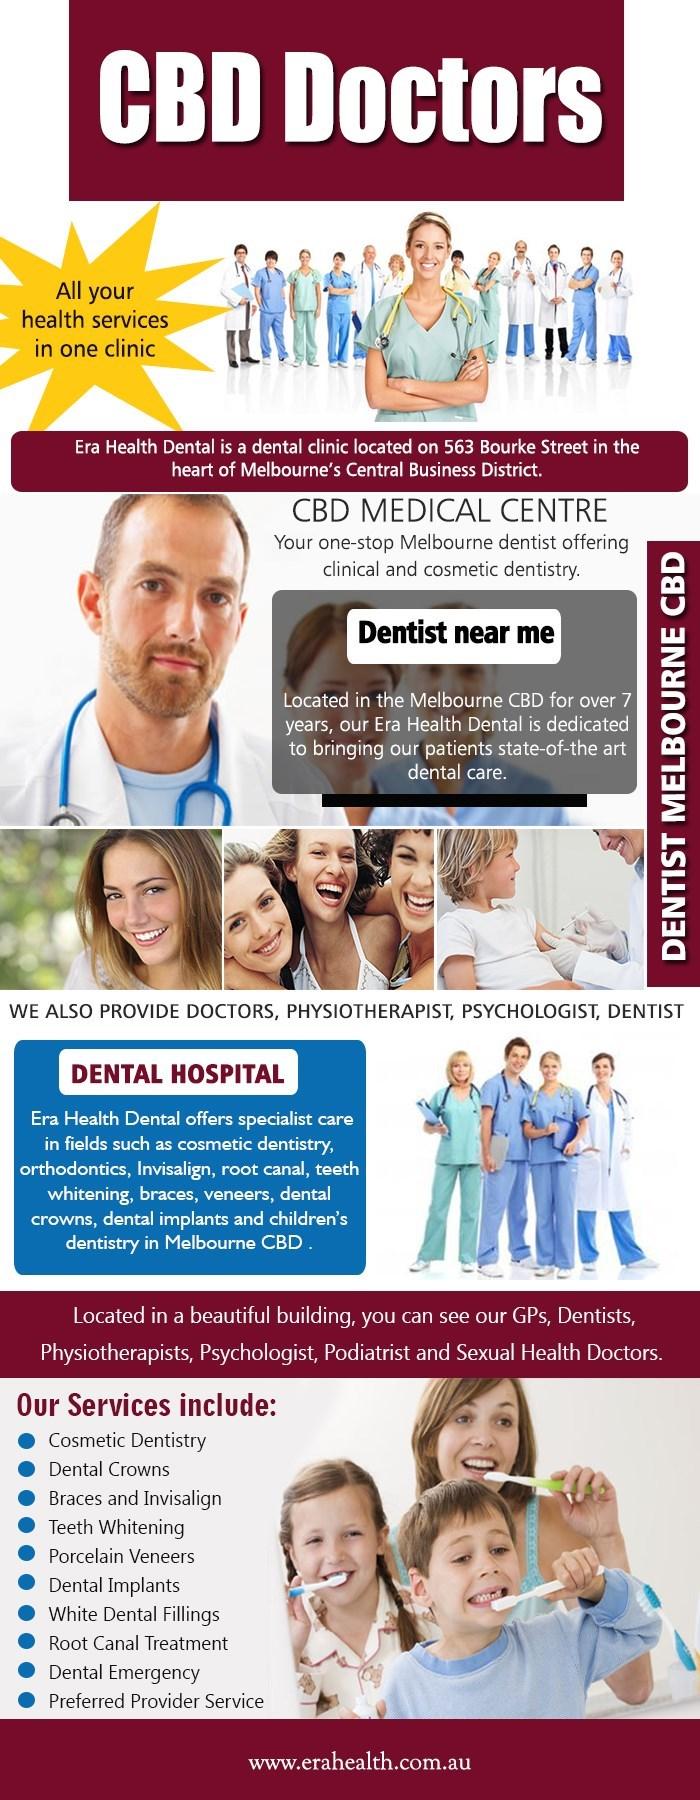 dental hospital - Cheezburger - Funny Memes | Funny Pictures